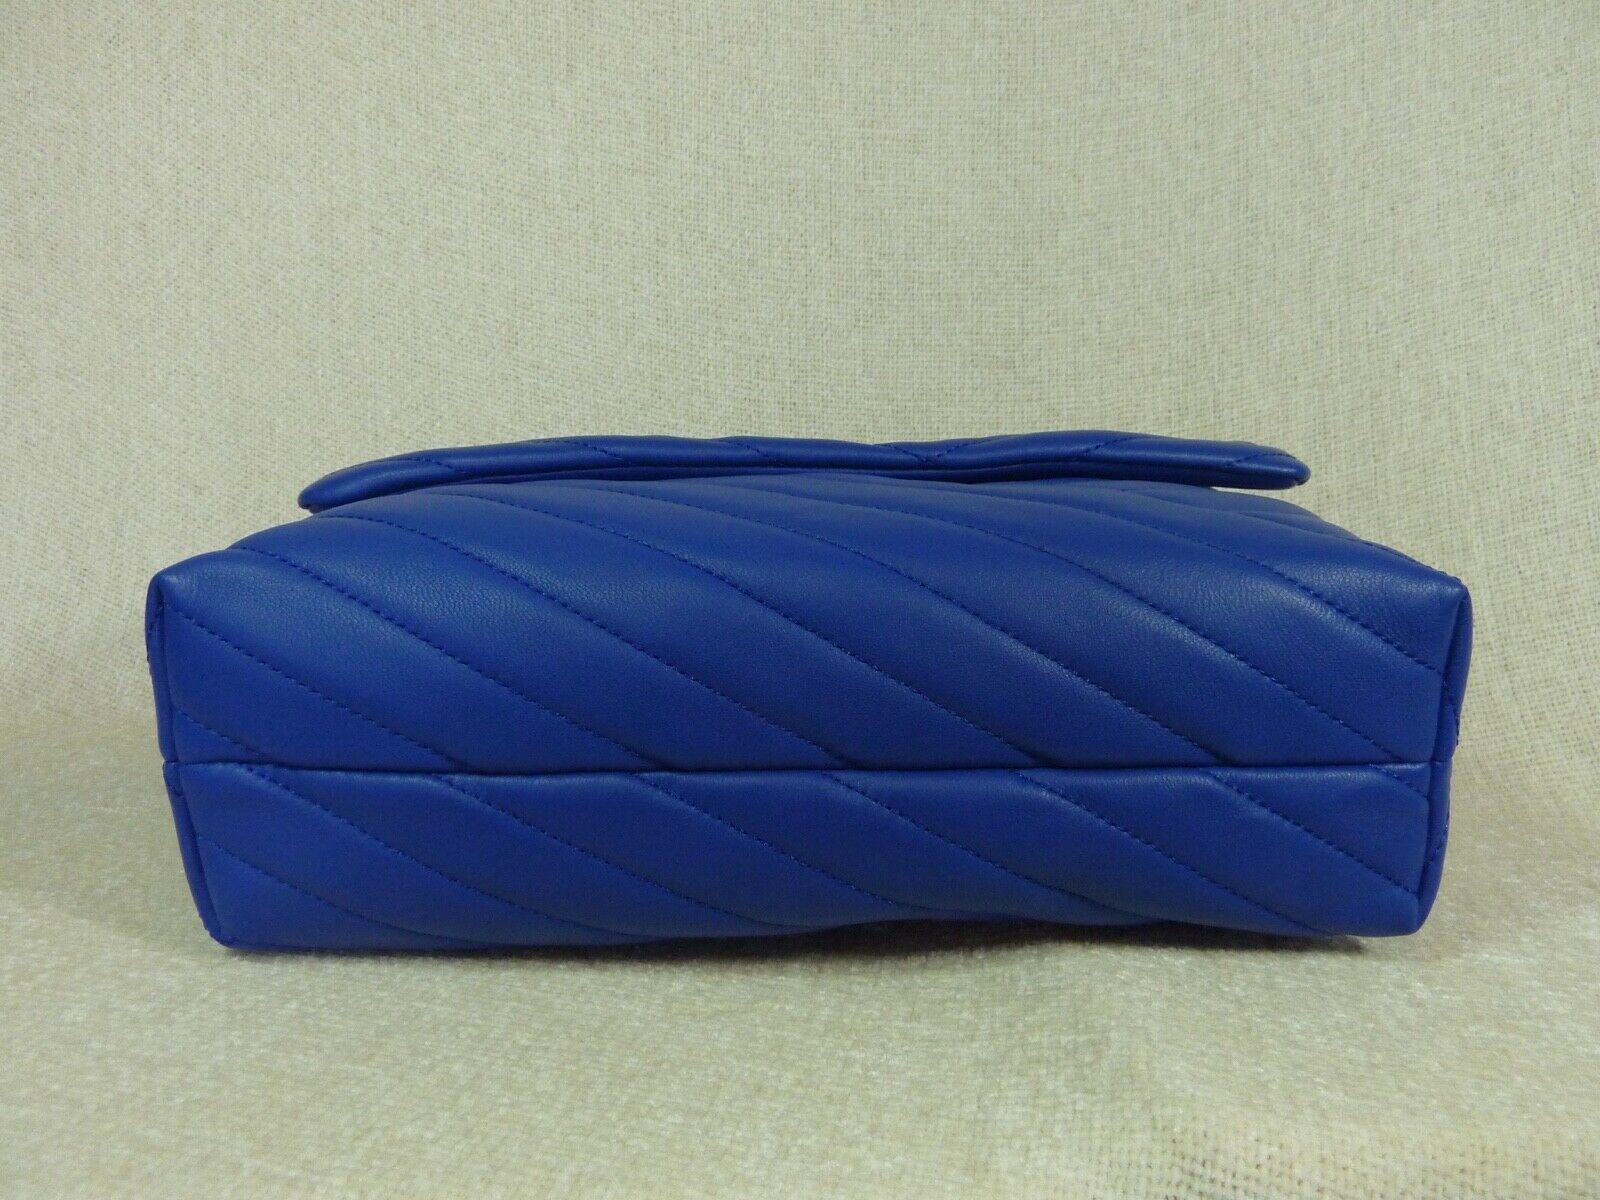 NWT Tory Burch Nautical Blue Kira Chevron Convertible Shoulder Bag image 7